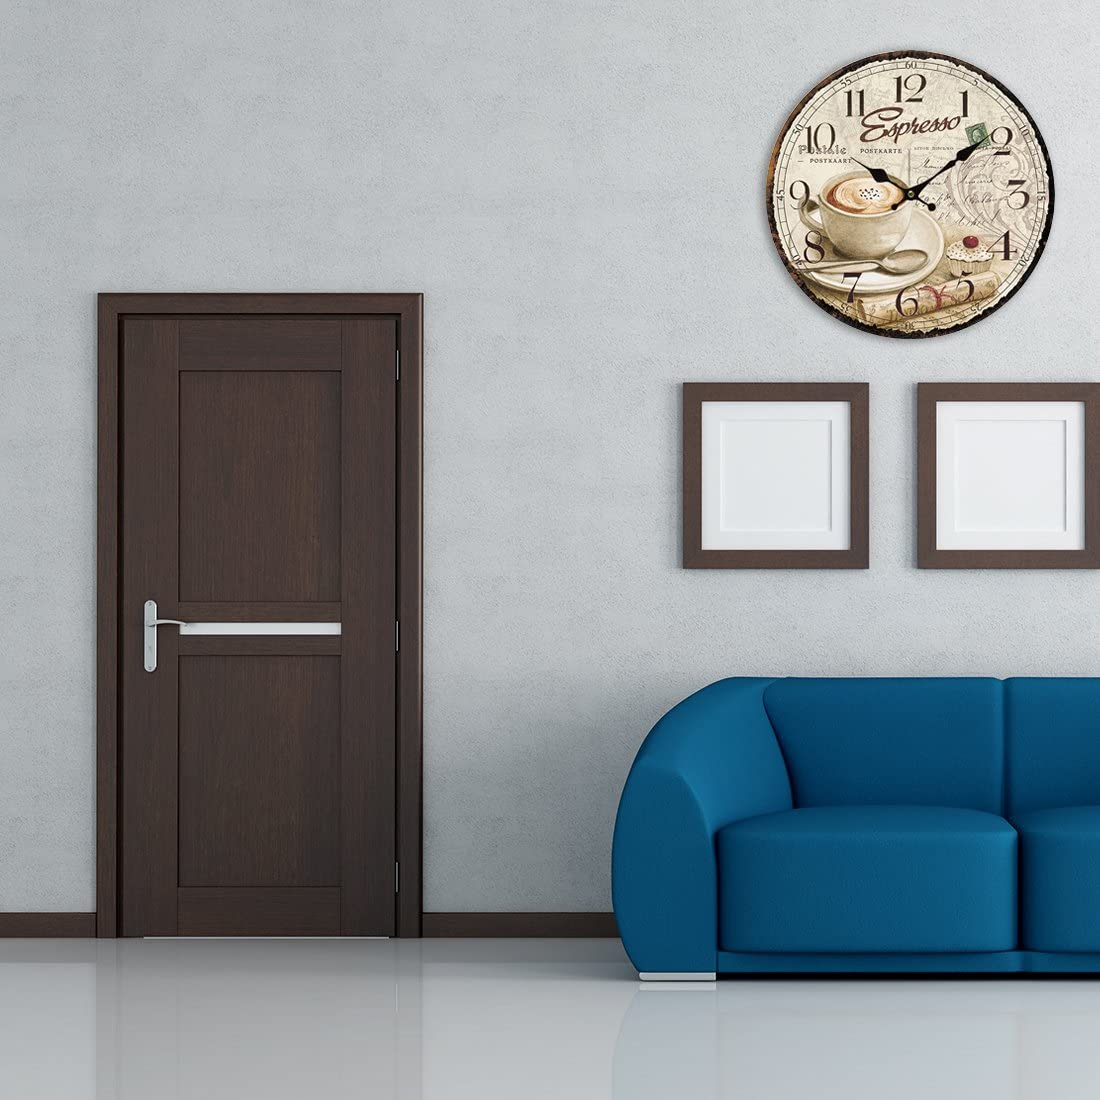 XSHION Wooden Wall Clock, 13 Inch Wall Clocks Decorative Living Room Art European Antique Style Coffee-3